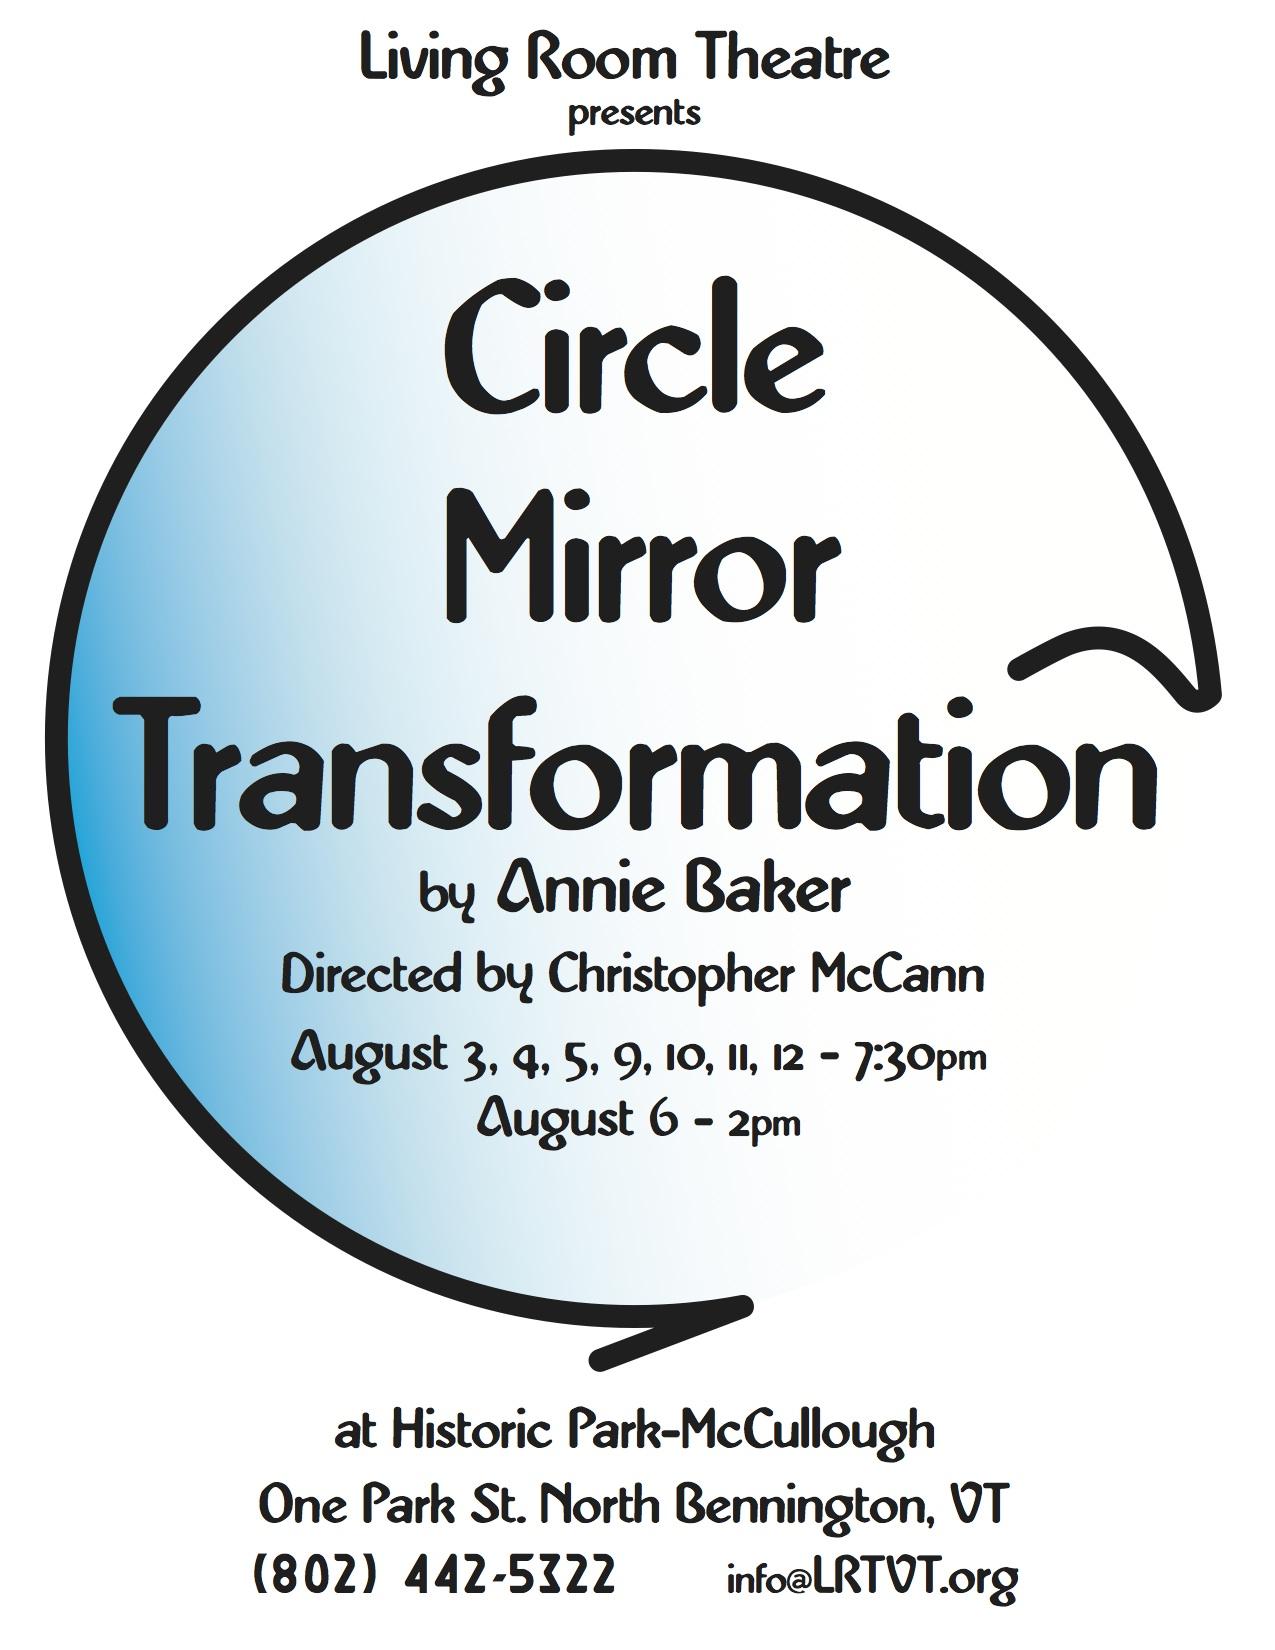 Circle Mirror_8x11_Web.jpg